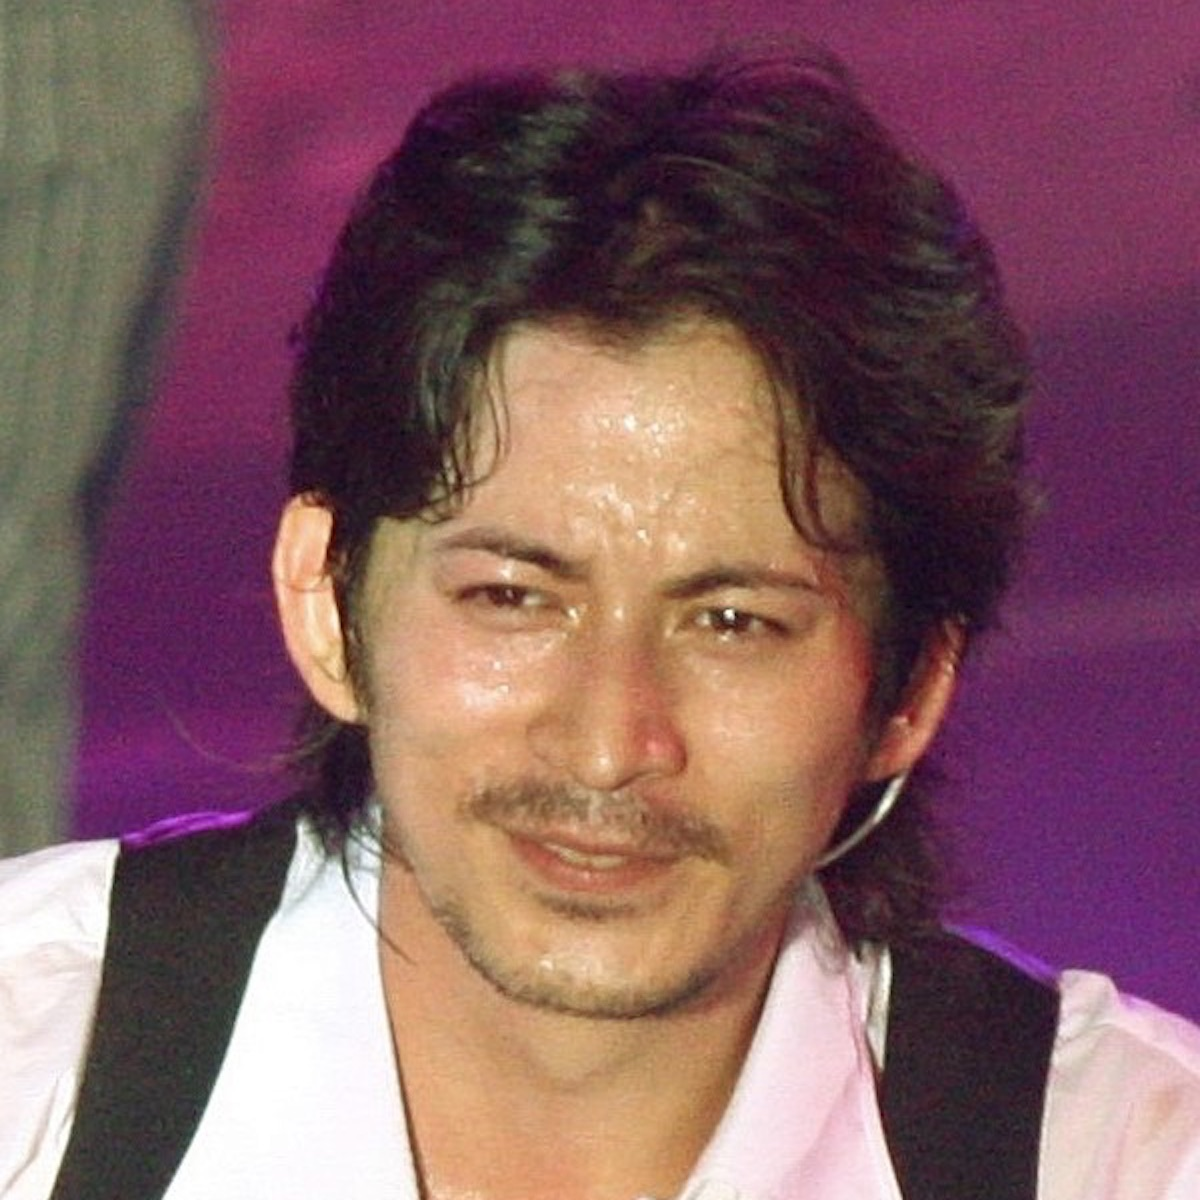 V6・岡田准一、『アメトーーク』での霜降り明星・粗品イジリに「鬼畜ドS」「いい仕事してた」と反響(2019/05/27 1527)|サイゾーウーマン